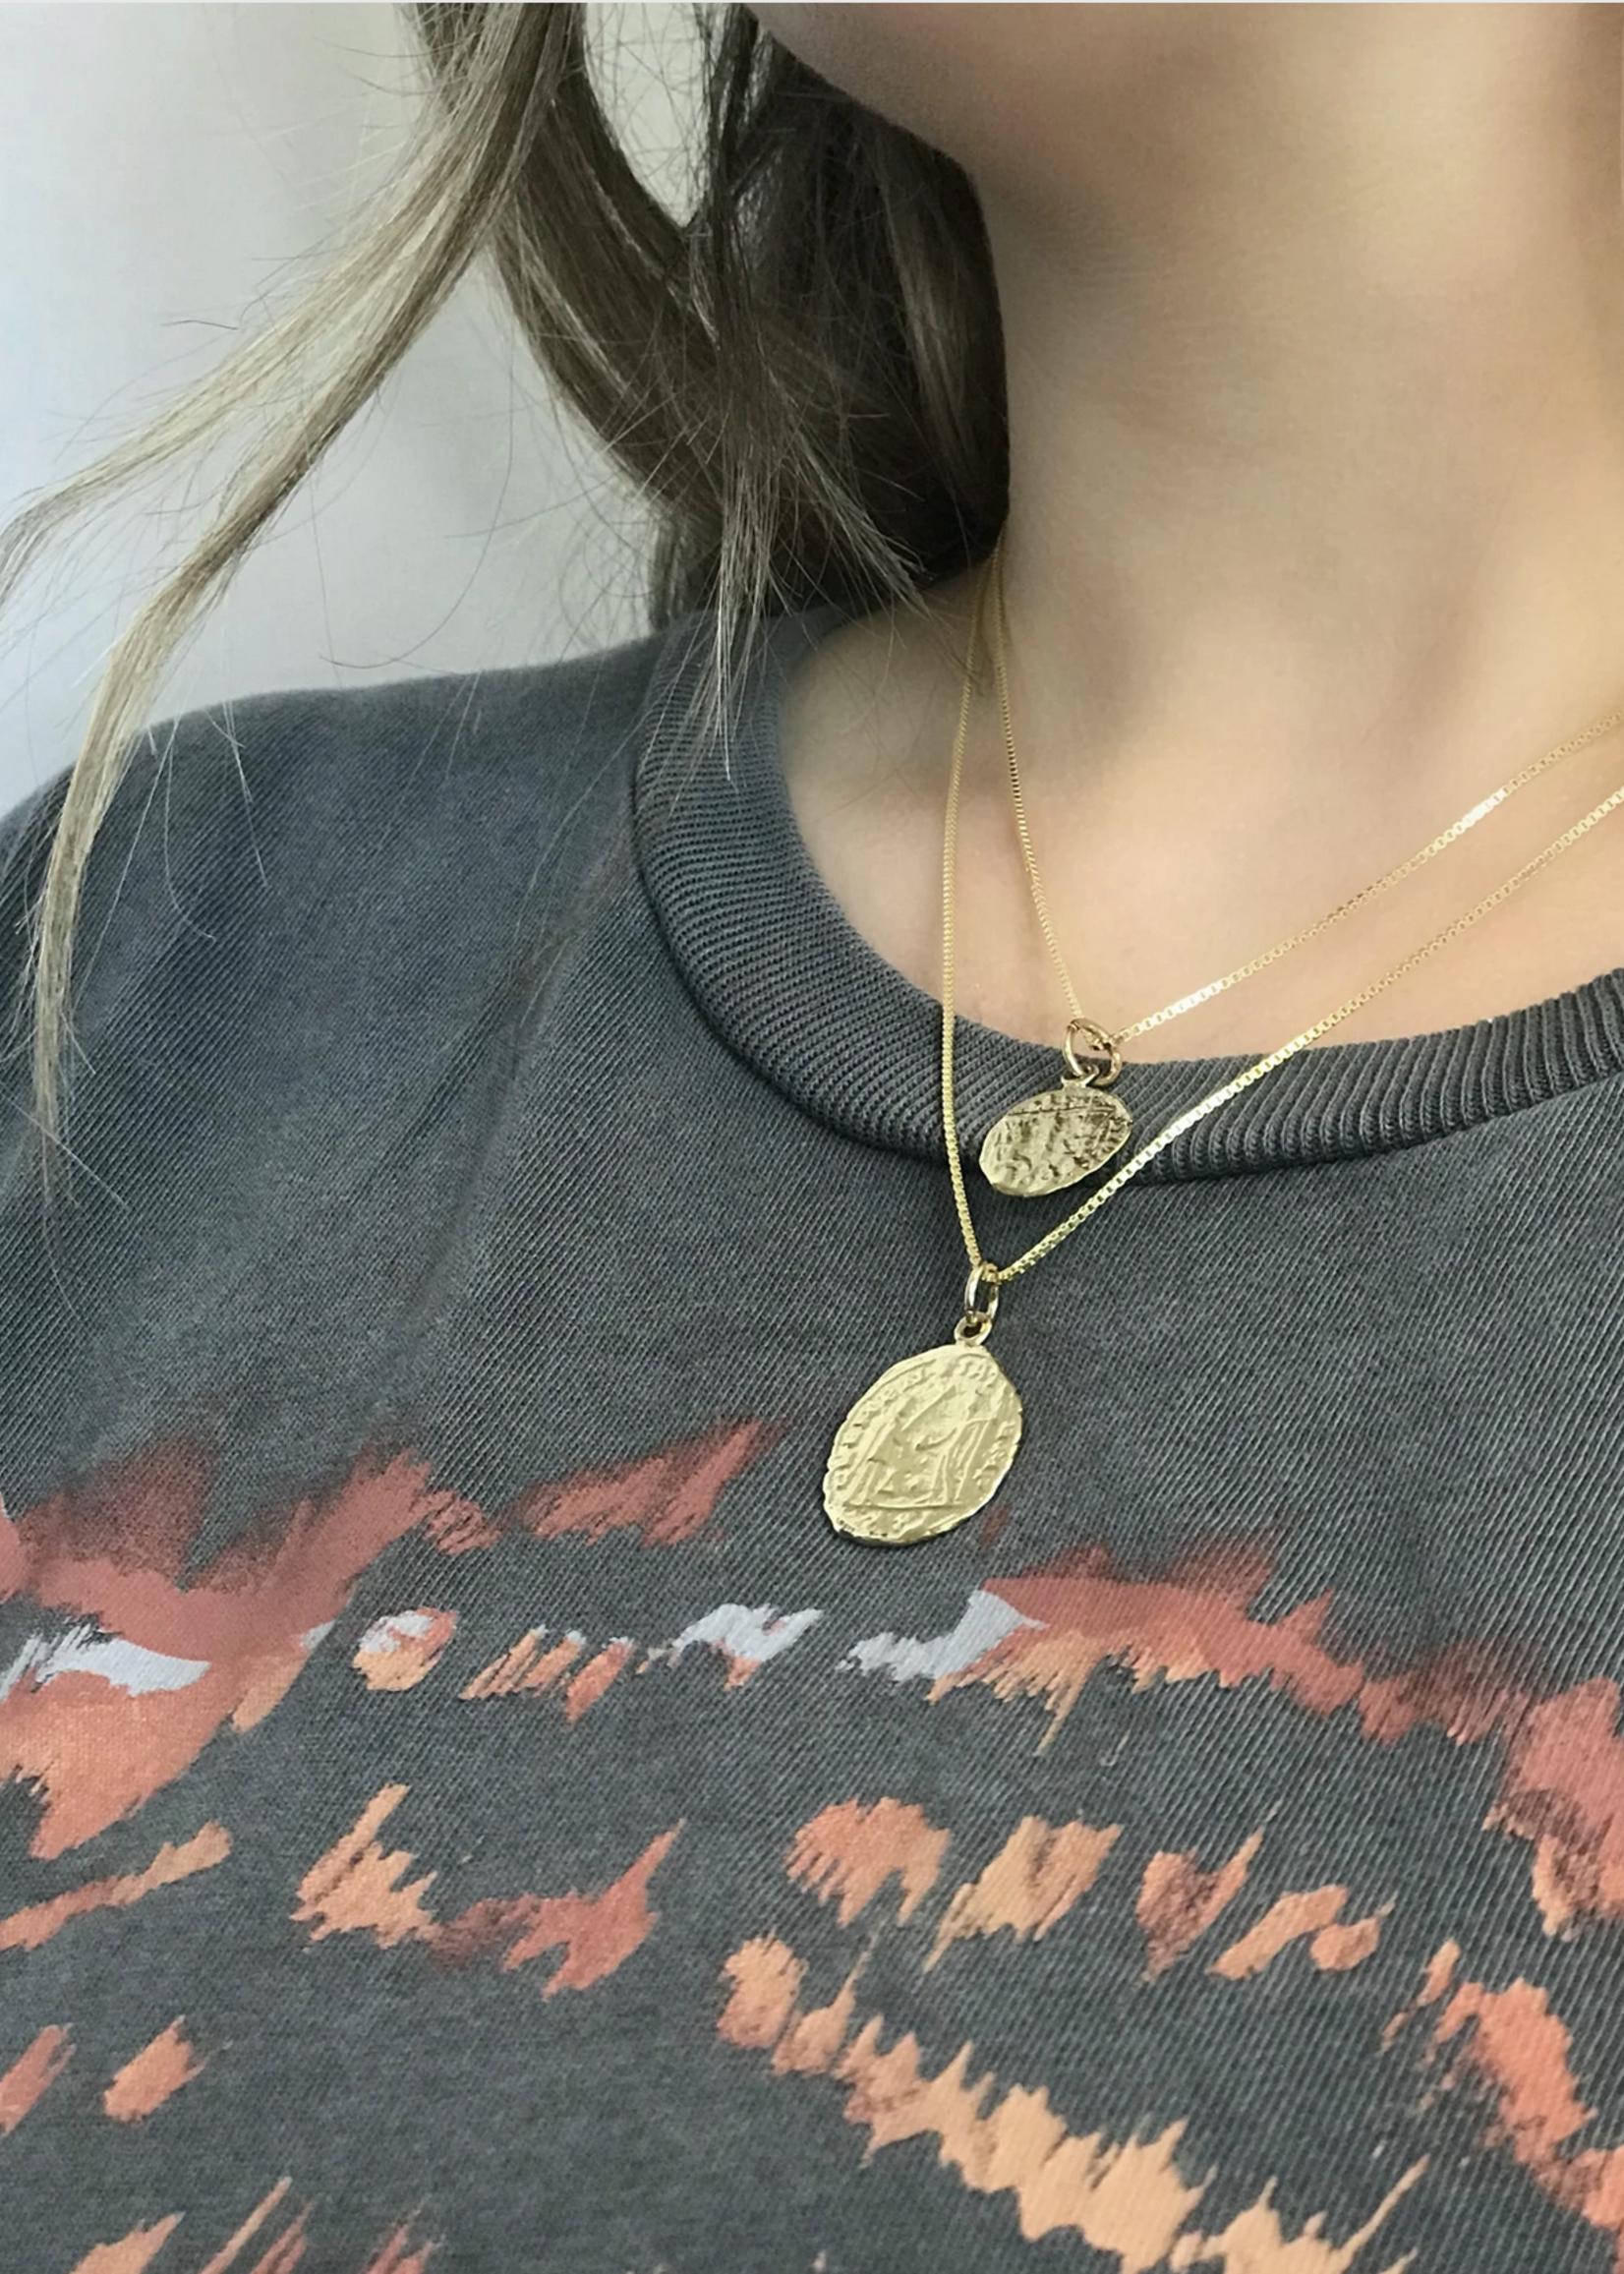 lotus jewelry studio lotus small hermes coin necklace